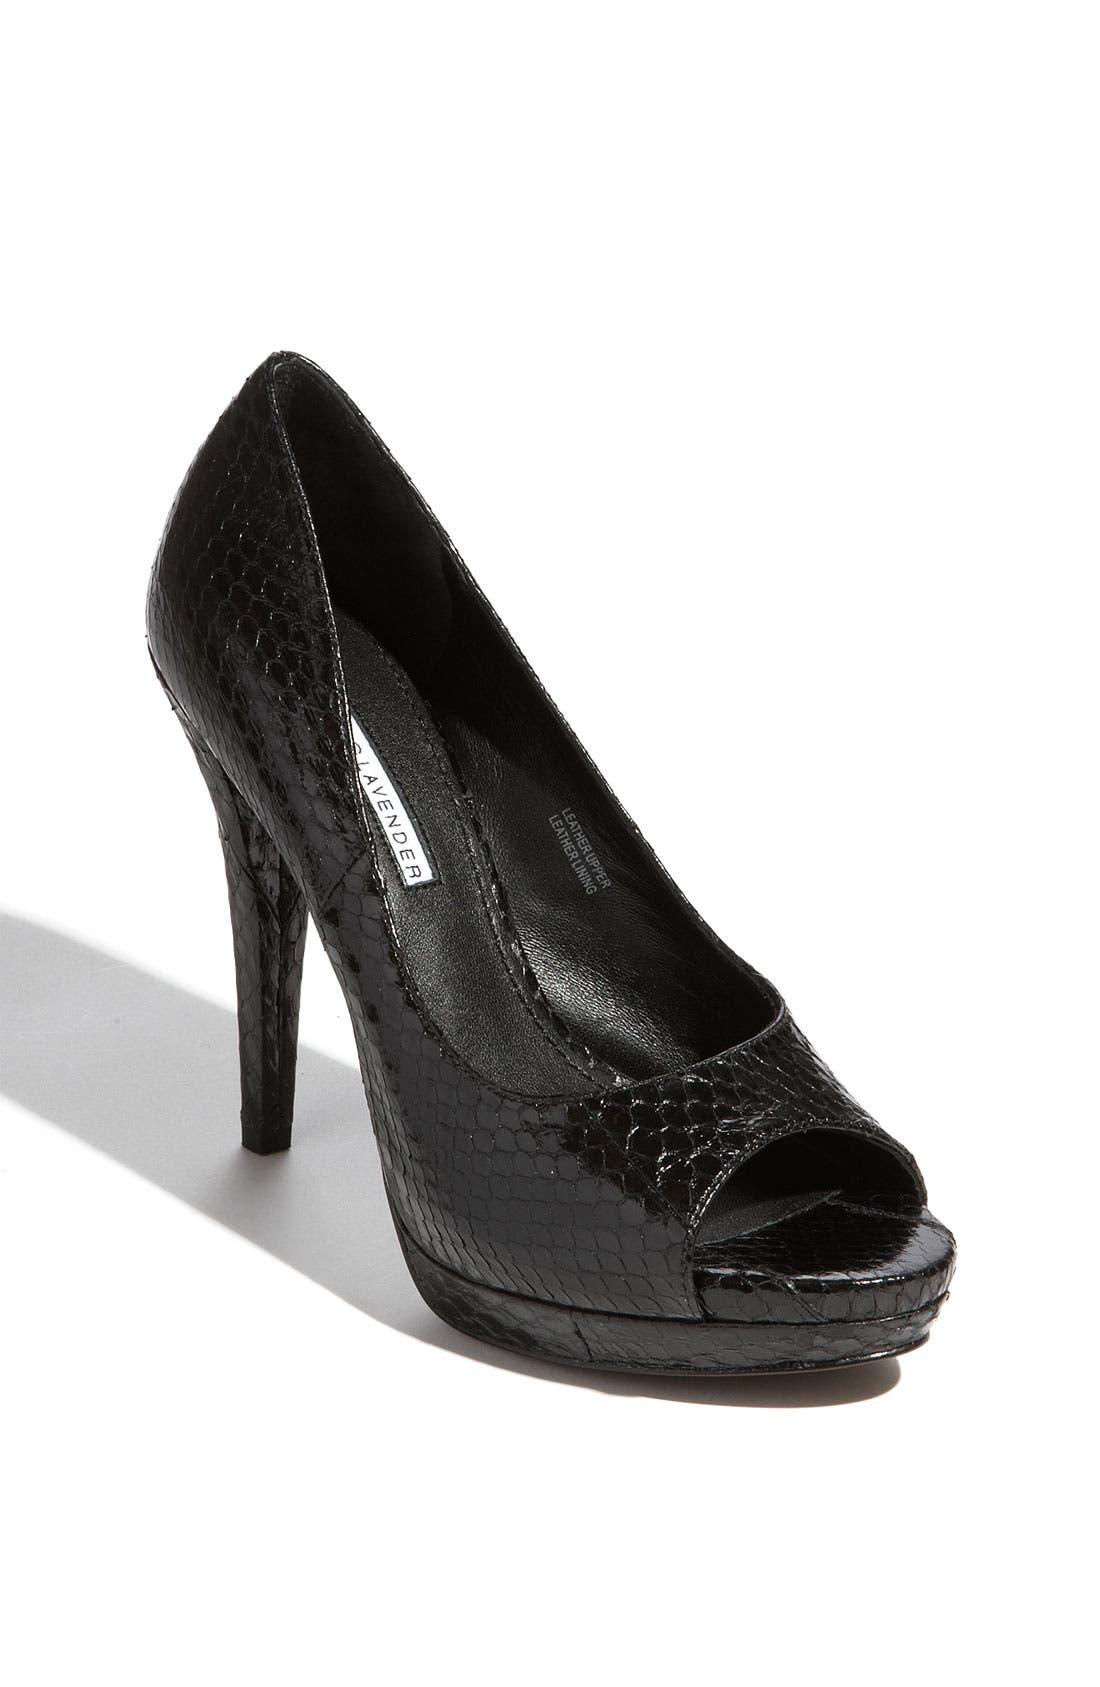 Footwear 'Selima' Peep Toe Pump,                         Main,                         color,